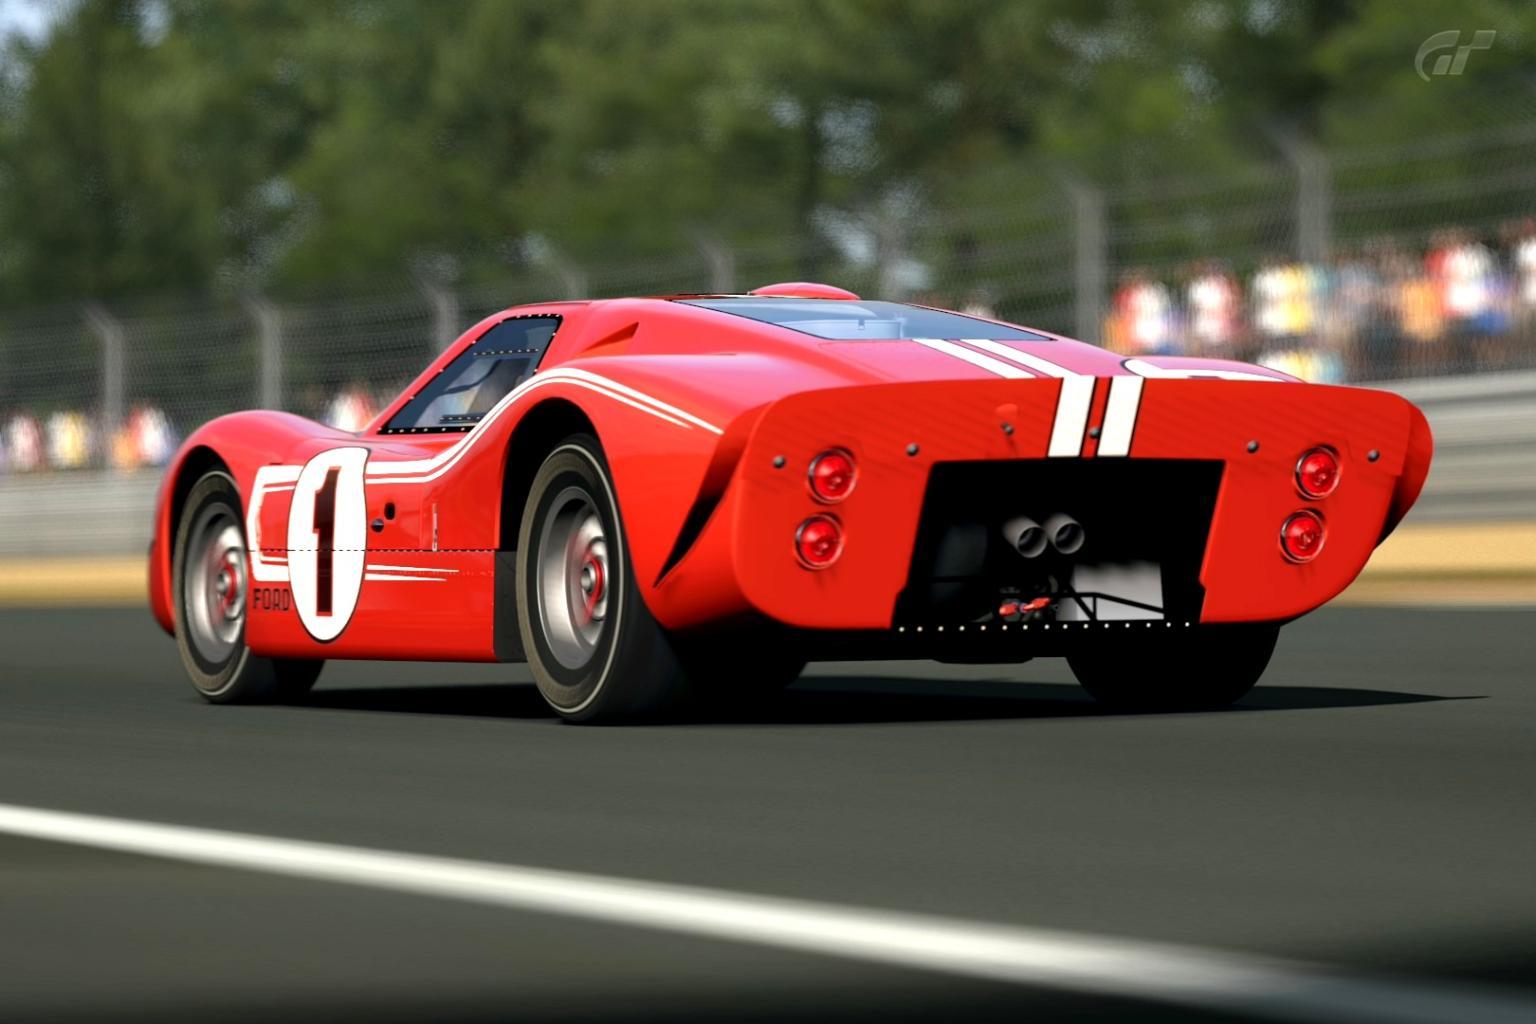 BigB's RCR MKIV-circuit-de-la-sarthe-2005-no-chicanes-_16-jpg